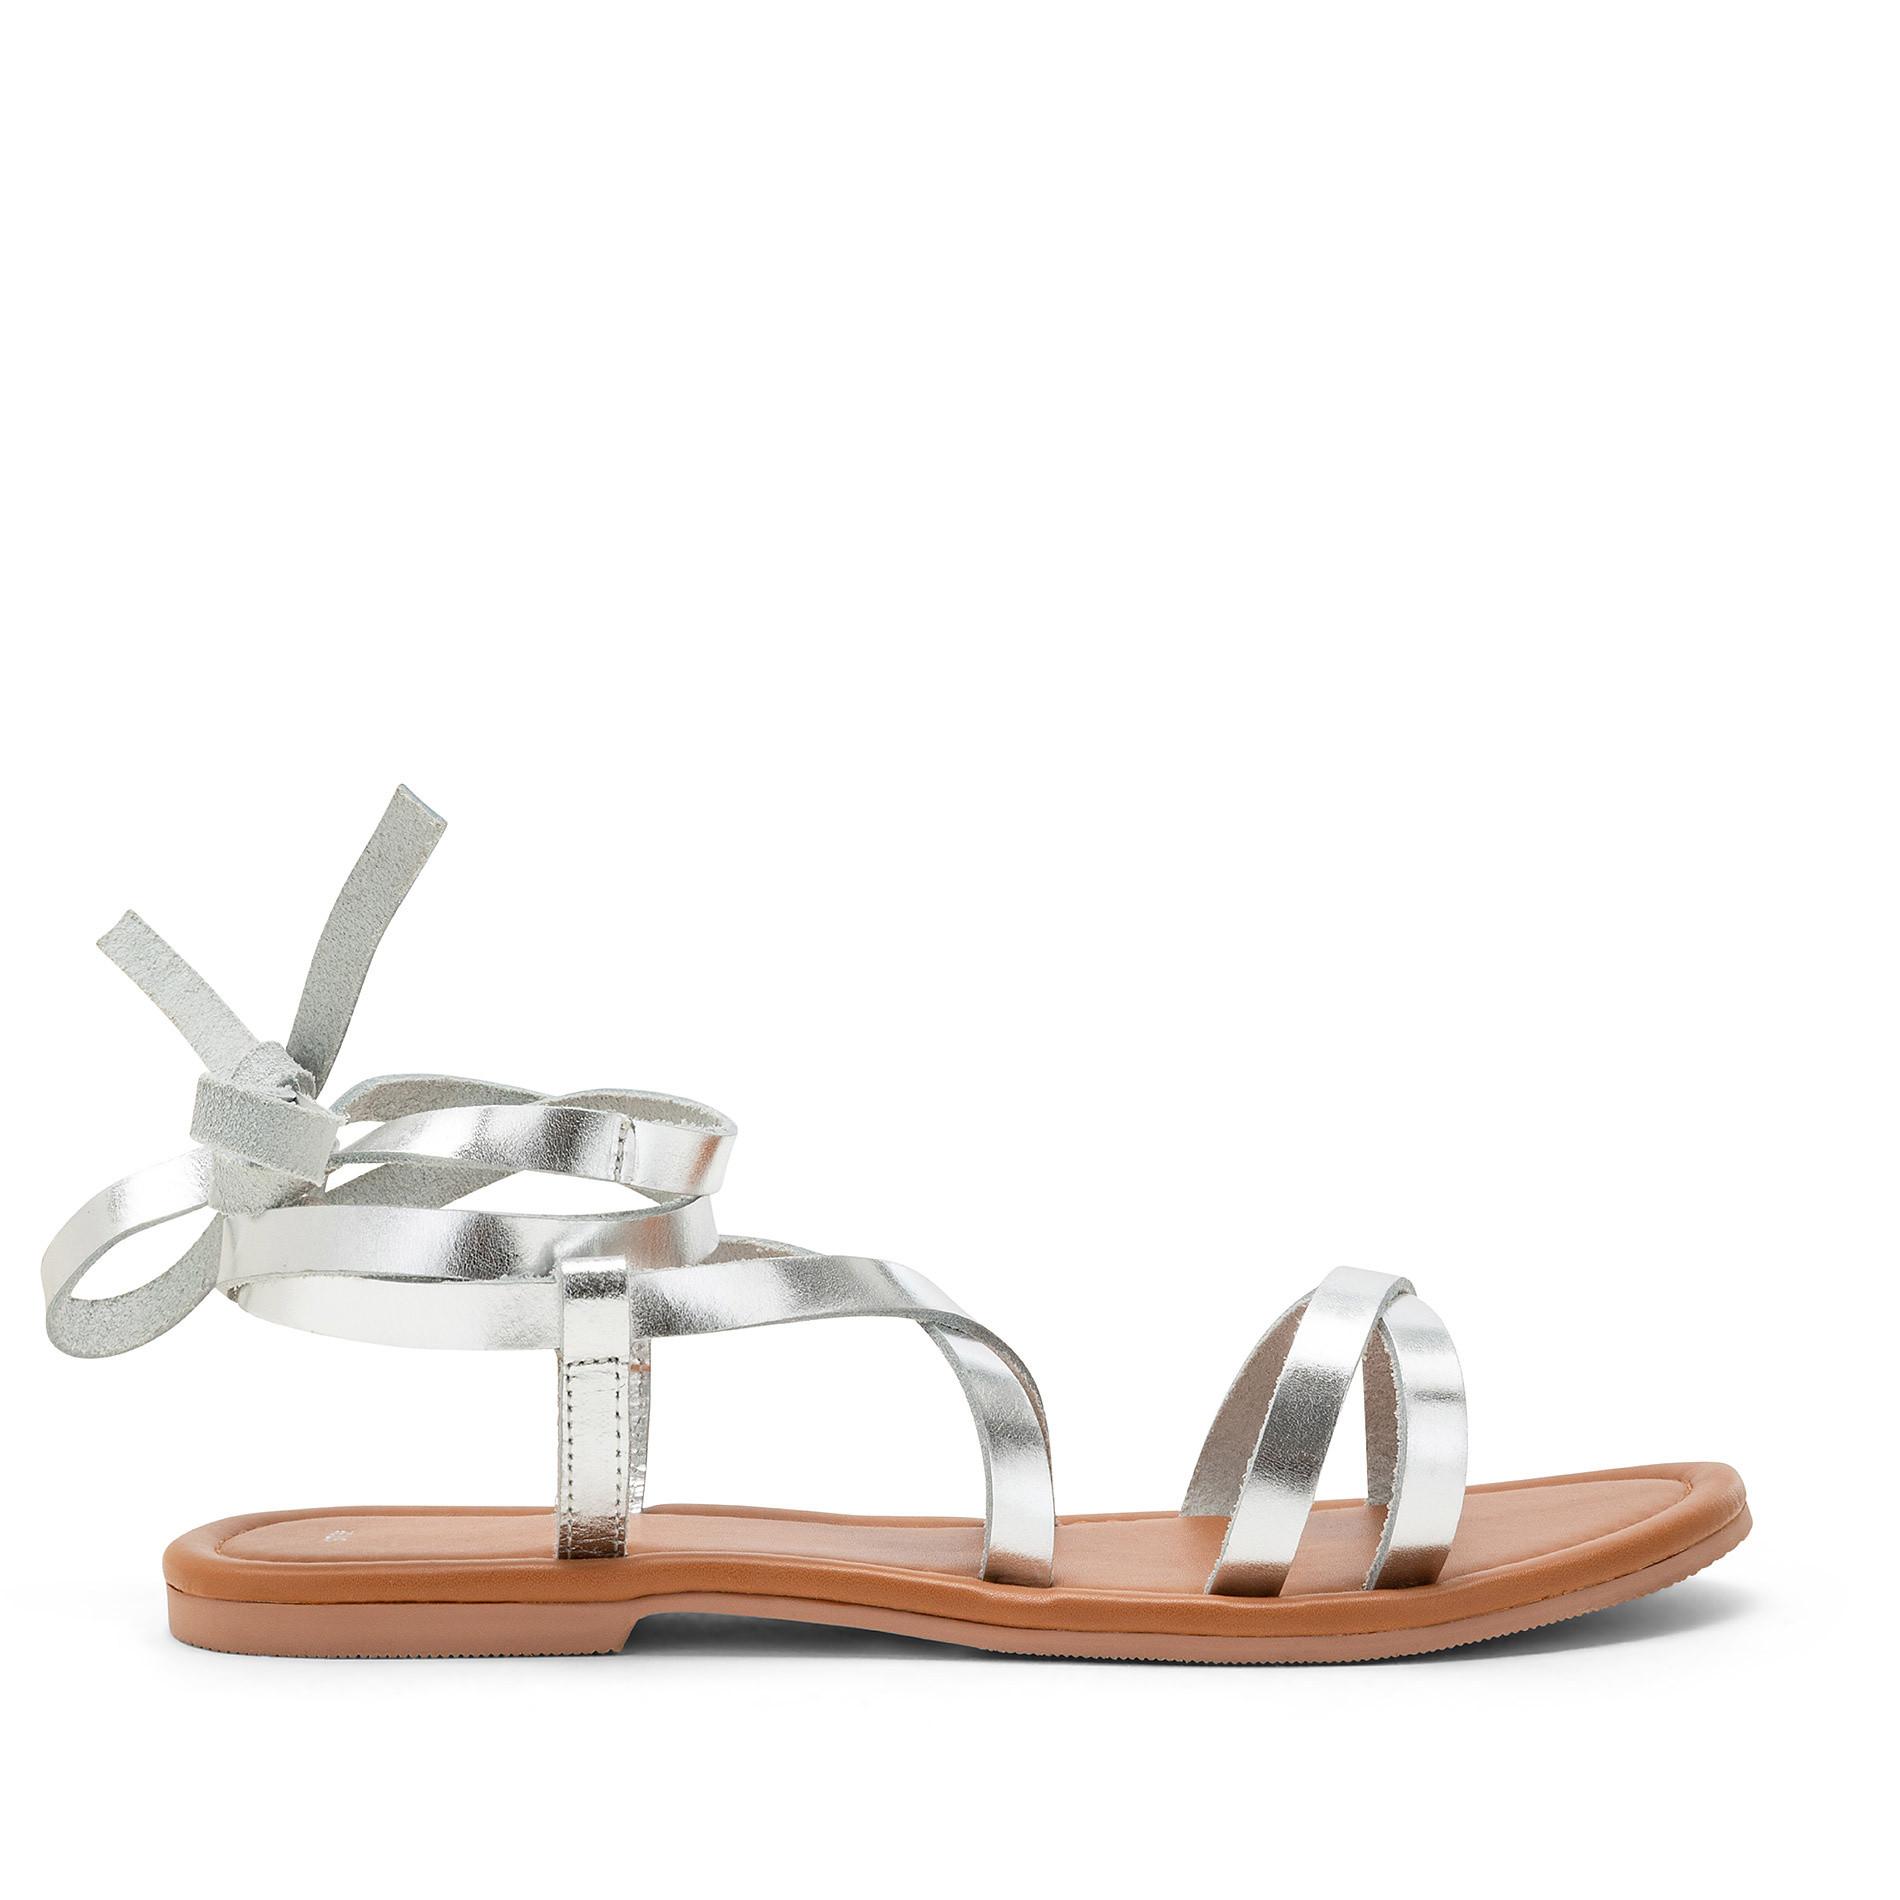 Sandalo con fascette metallizzate, Grigio argento, large image number 1